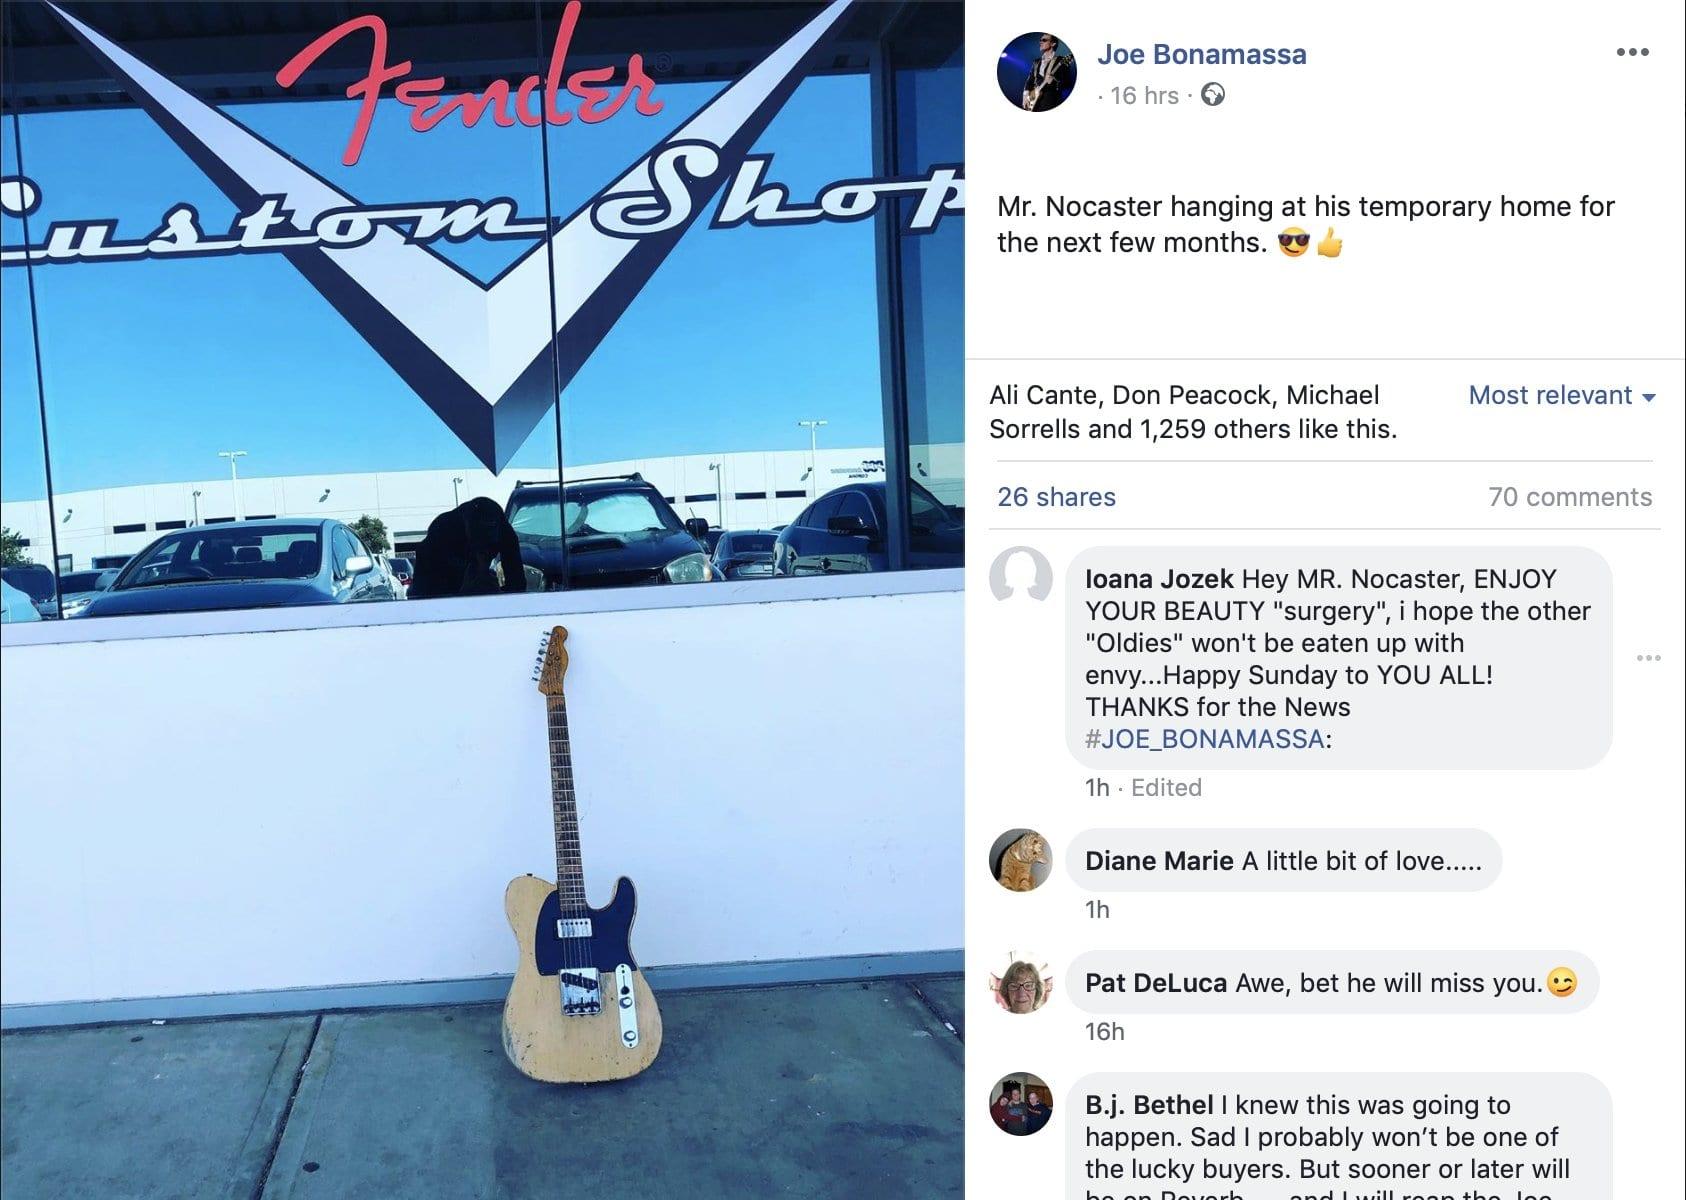 Joe Bonamassa teases Fender Custom Shop with Nocaster drop off